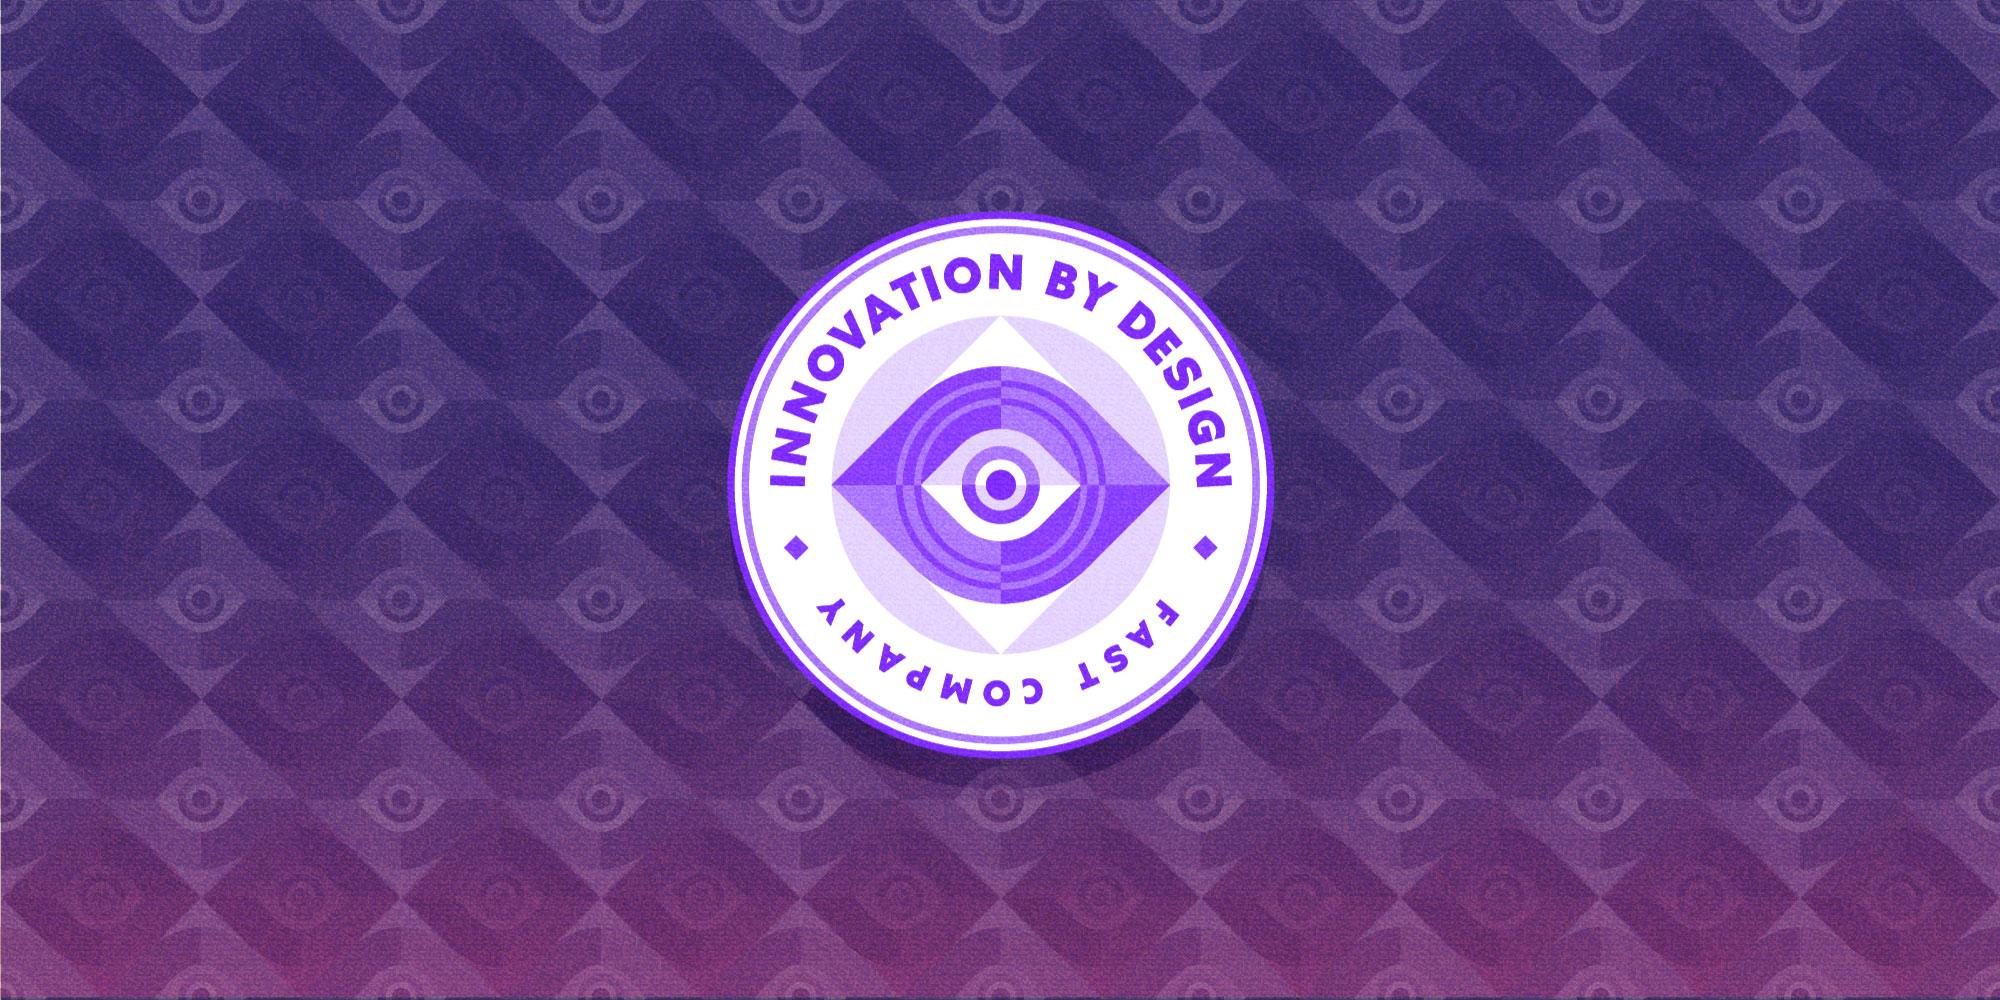 Fast Company Innovation by Design Awards 2018